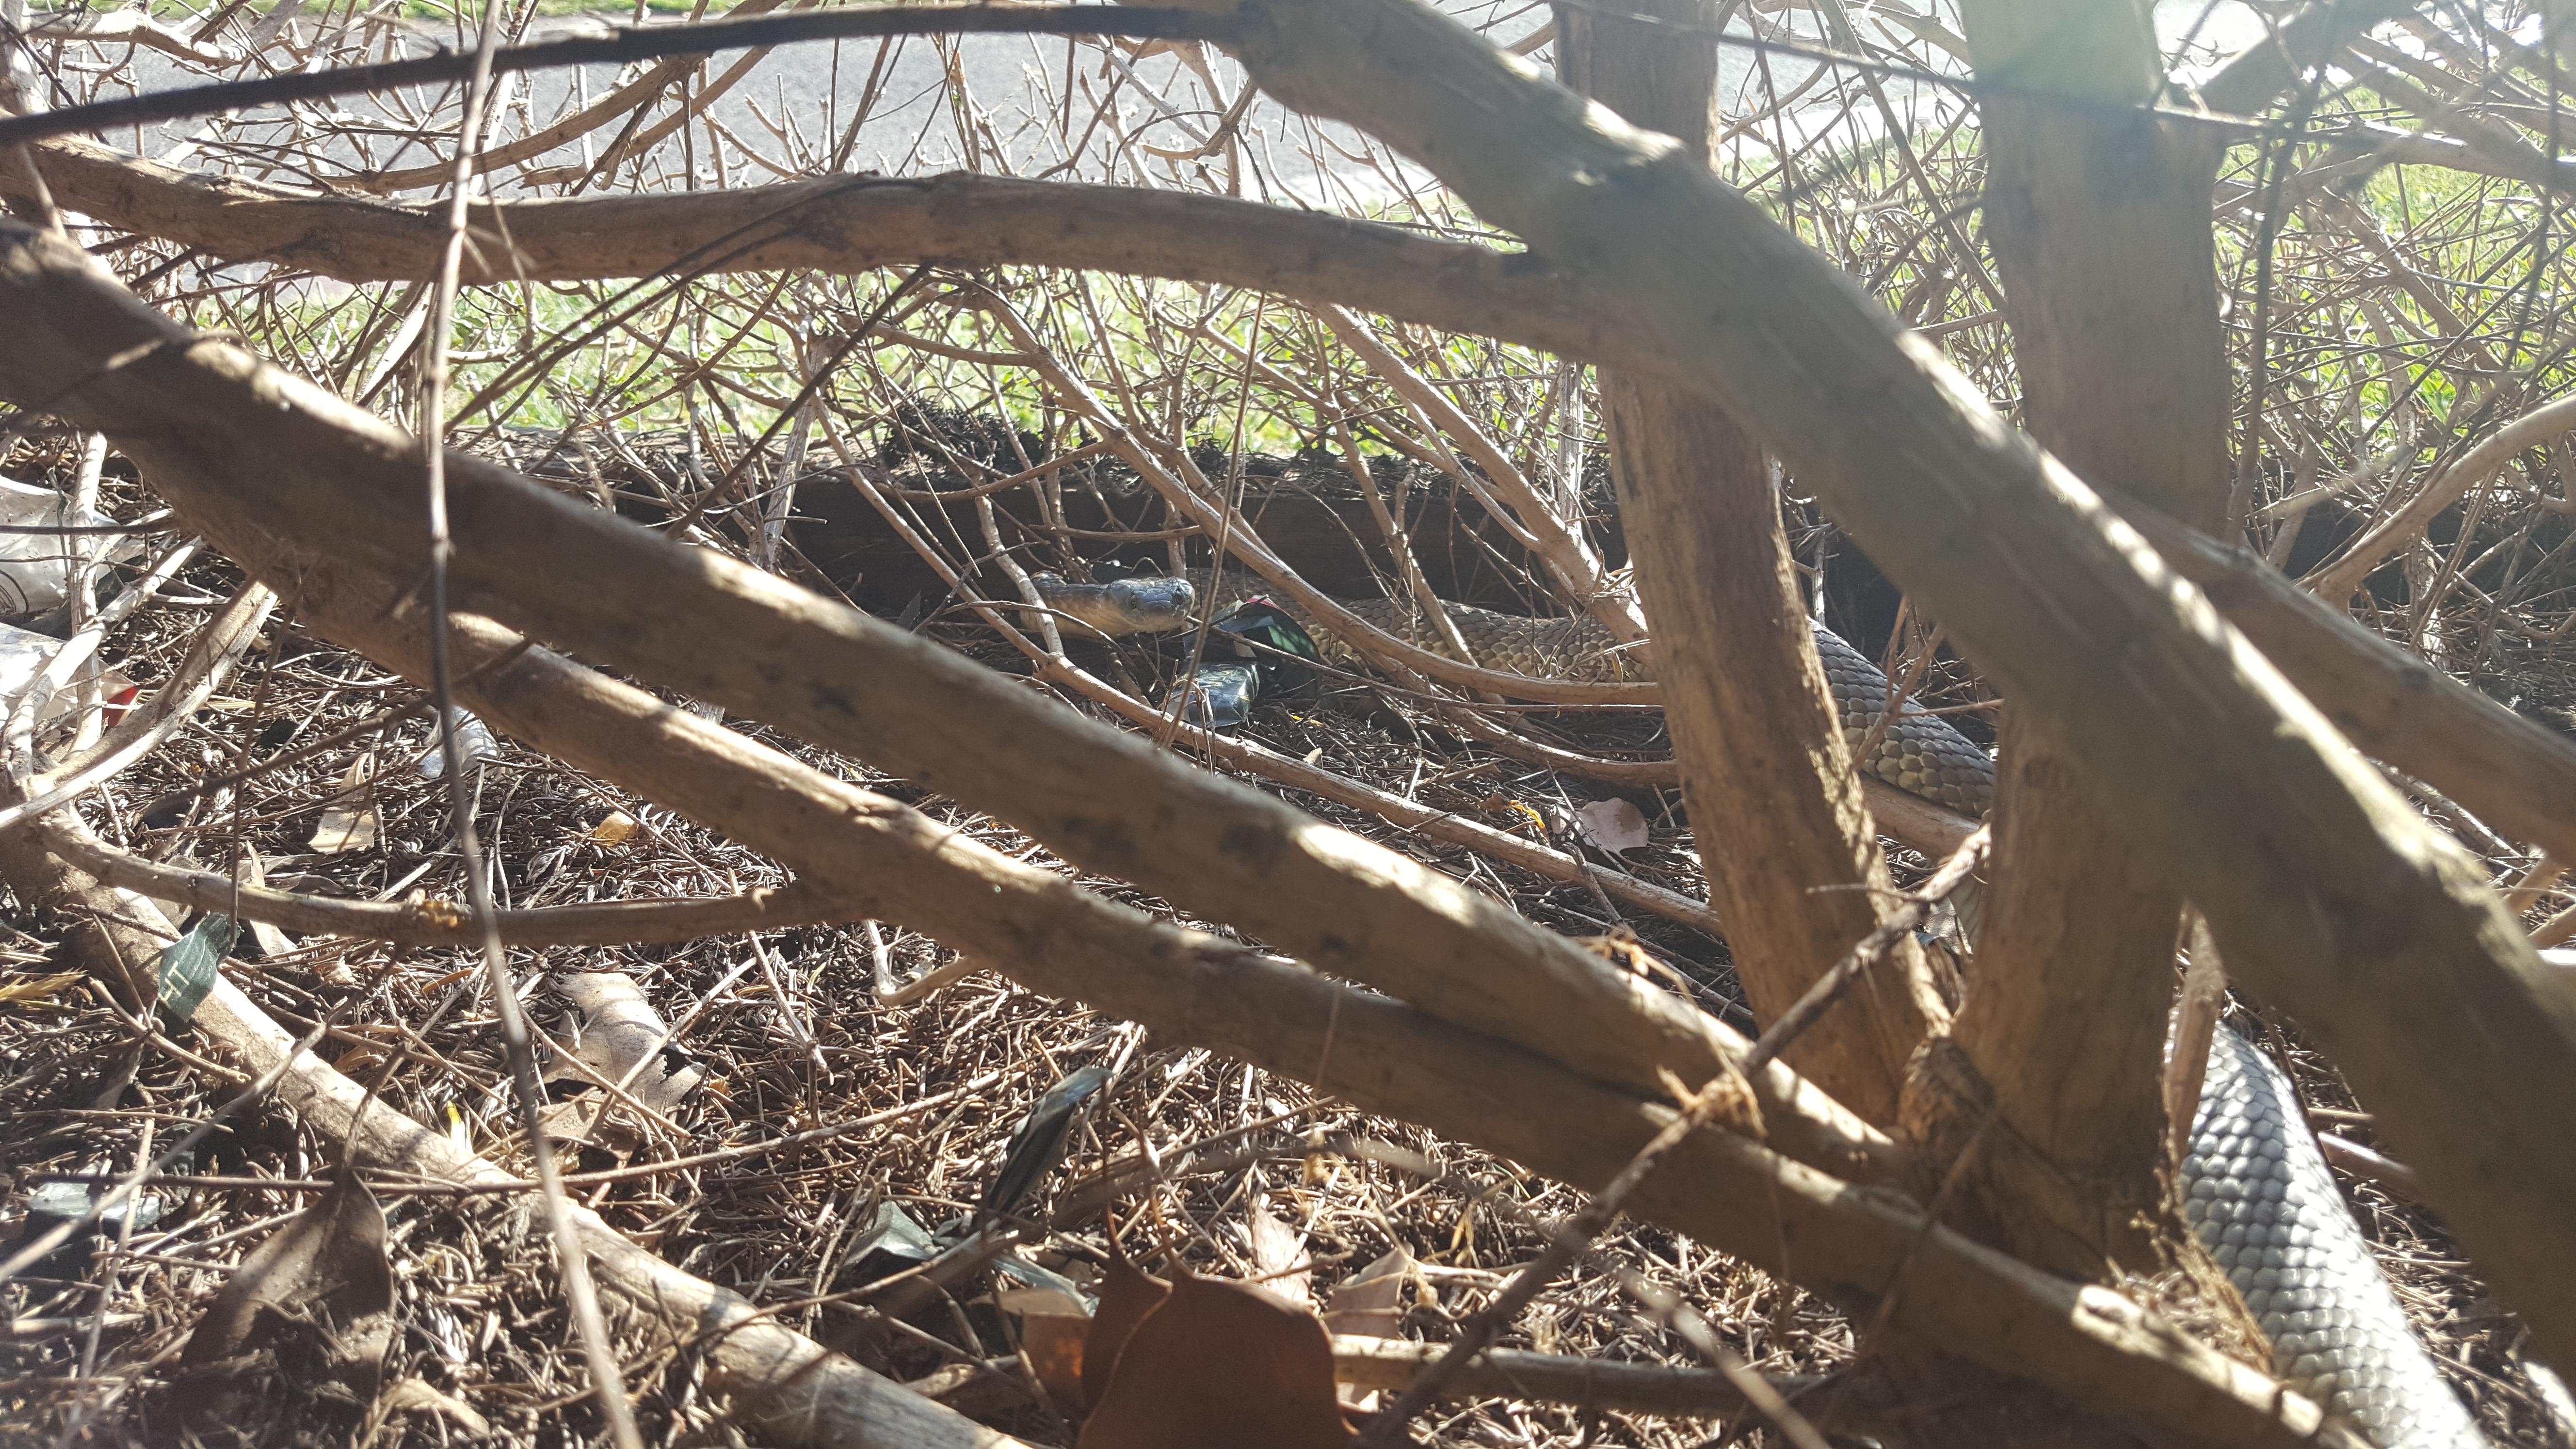 Eastern Tiger Snake Hiding in Bushes